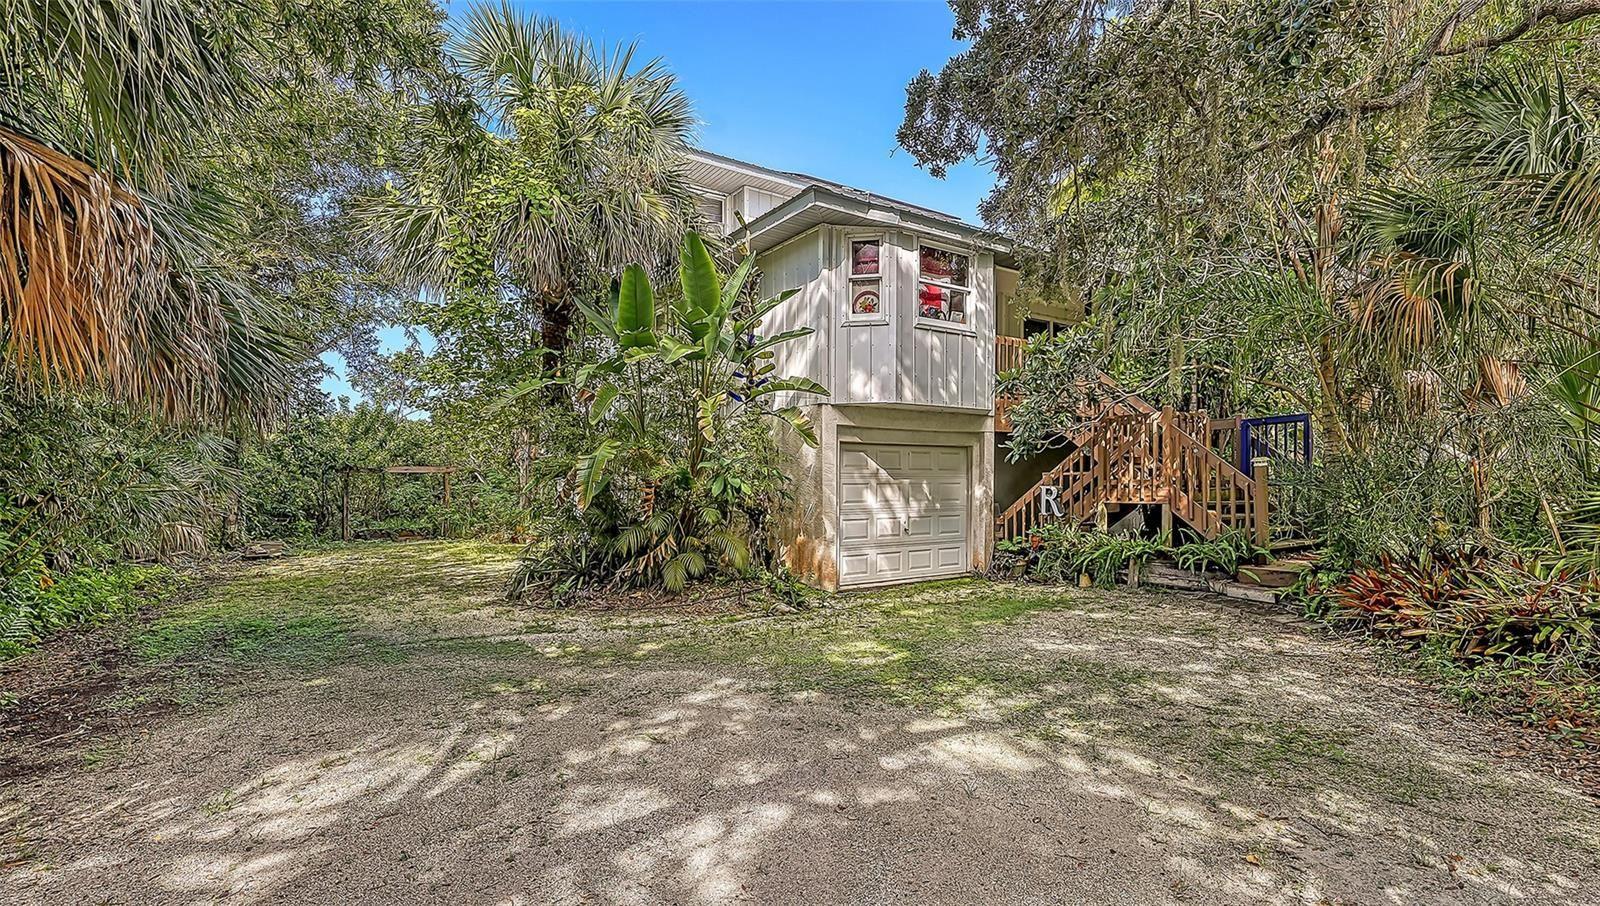 Photo of 1840 LEMON AVENUE, ENGLEWOOD, FL 34223 (MLS # A4510532)